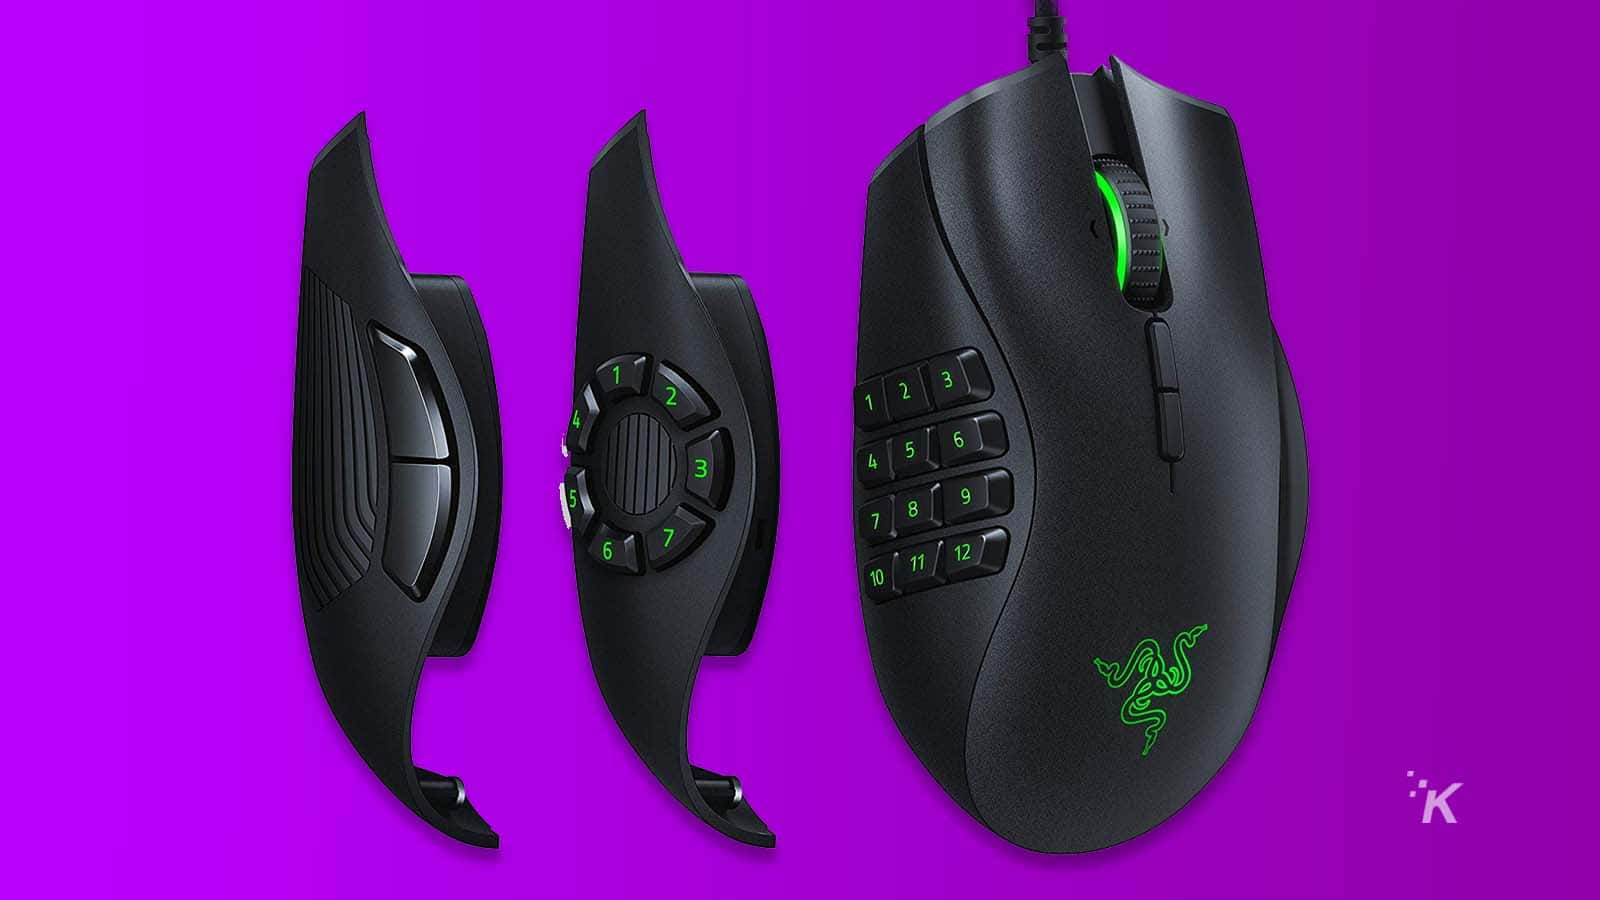 razer naga mouse black friday 2019